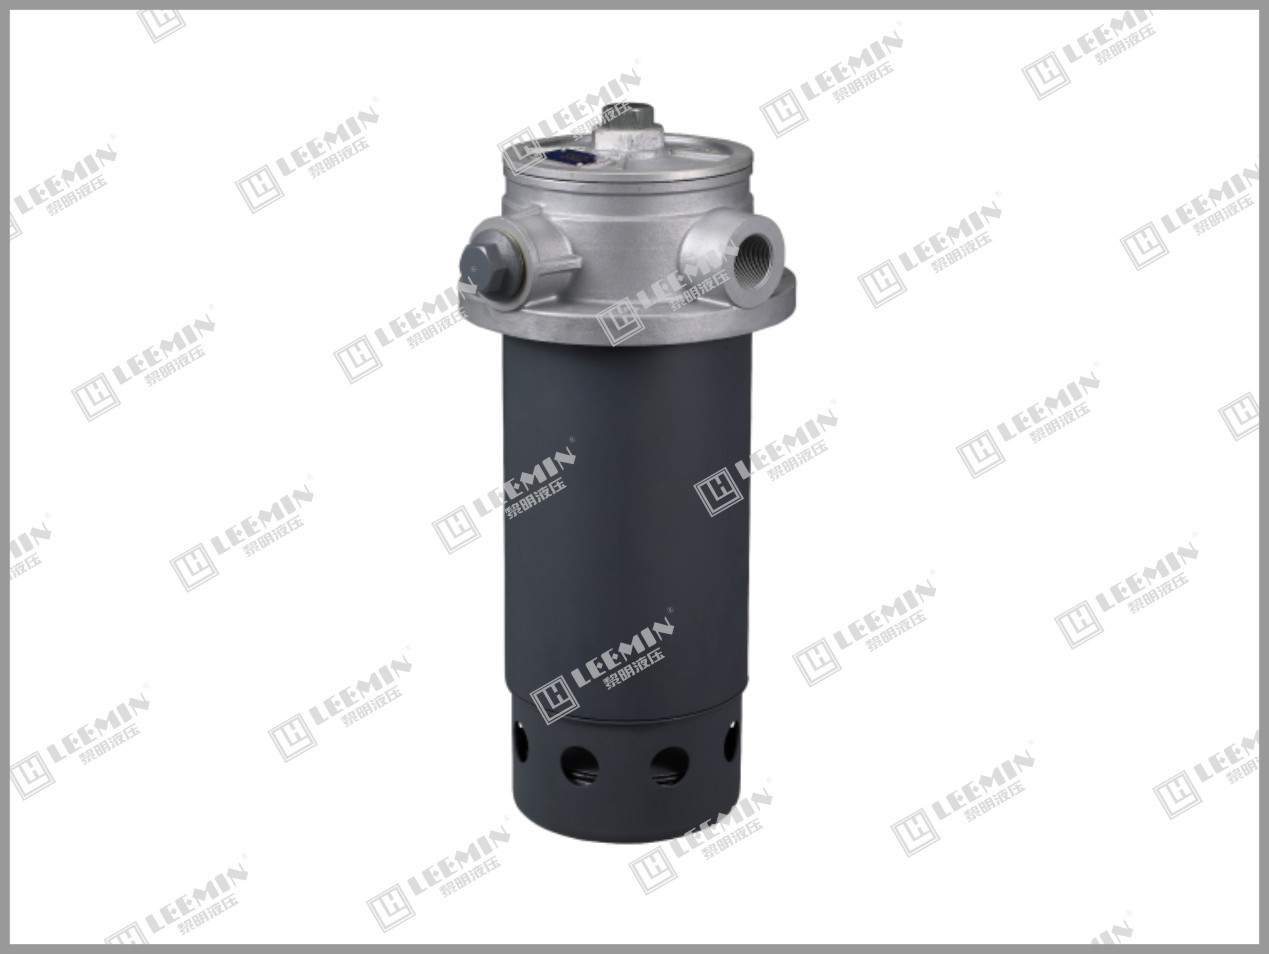 ZL12-122自封式磁性吸油过滤器